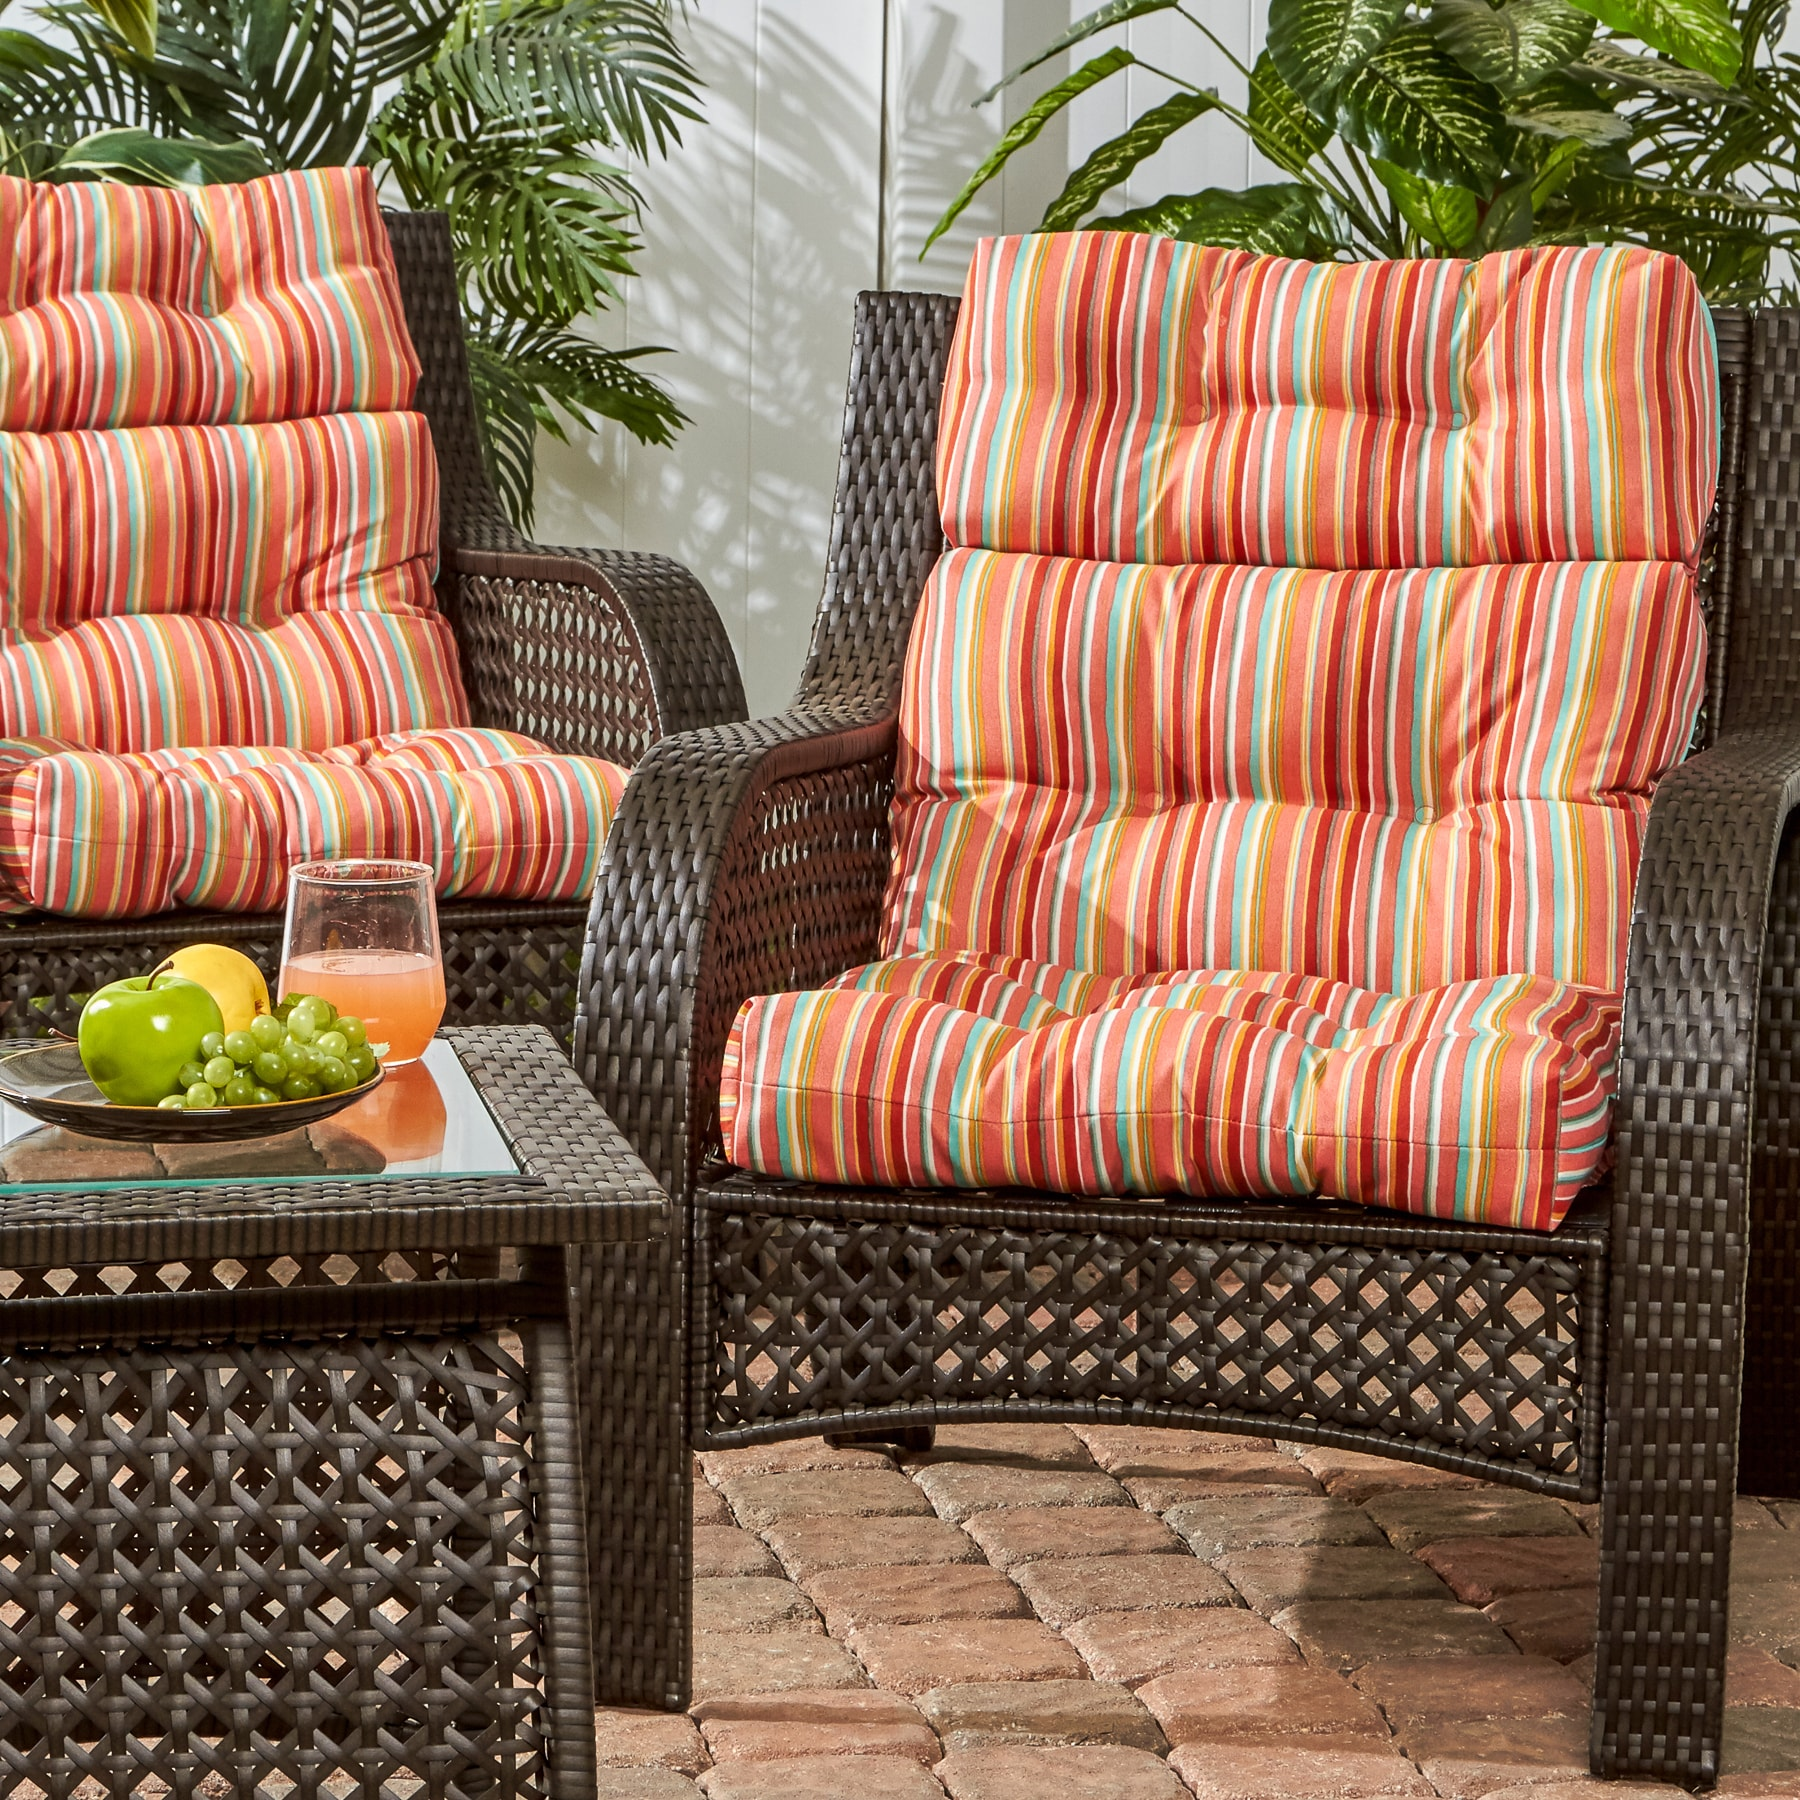 Shop 3 Section Outdoor Coastal Stripe High Back Chair Cushion Set